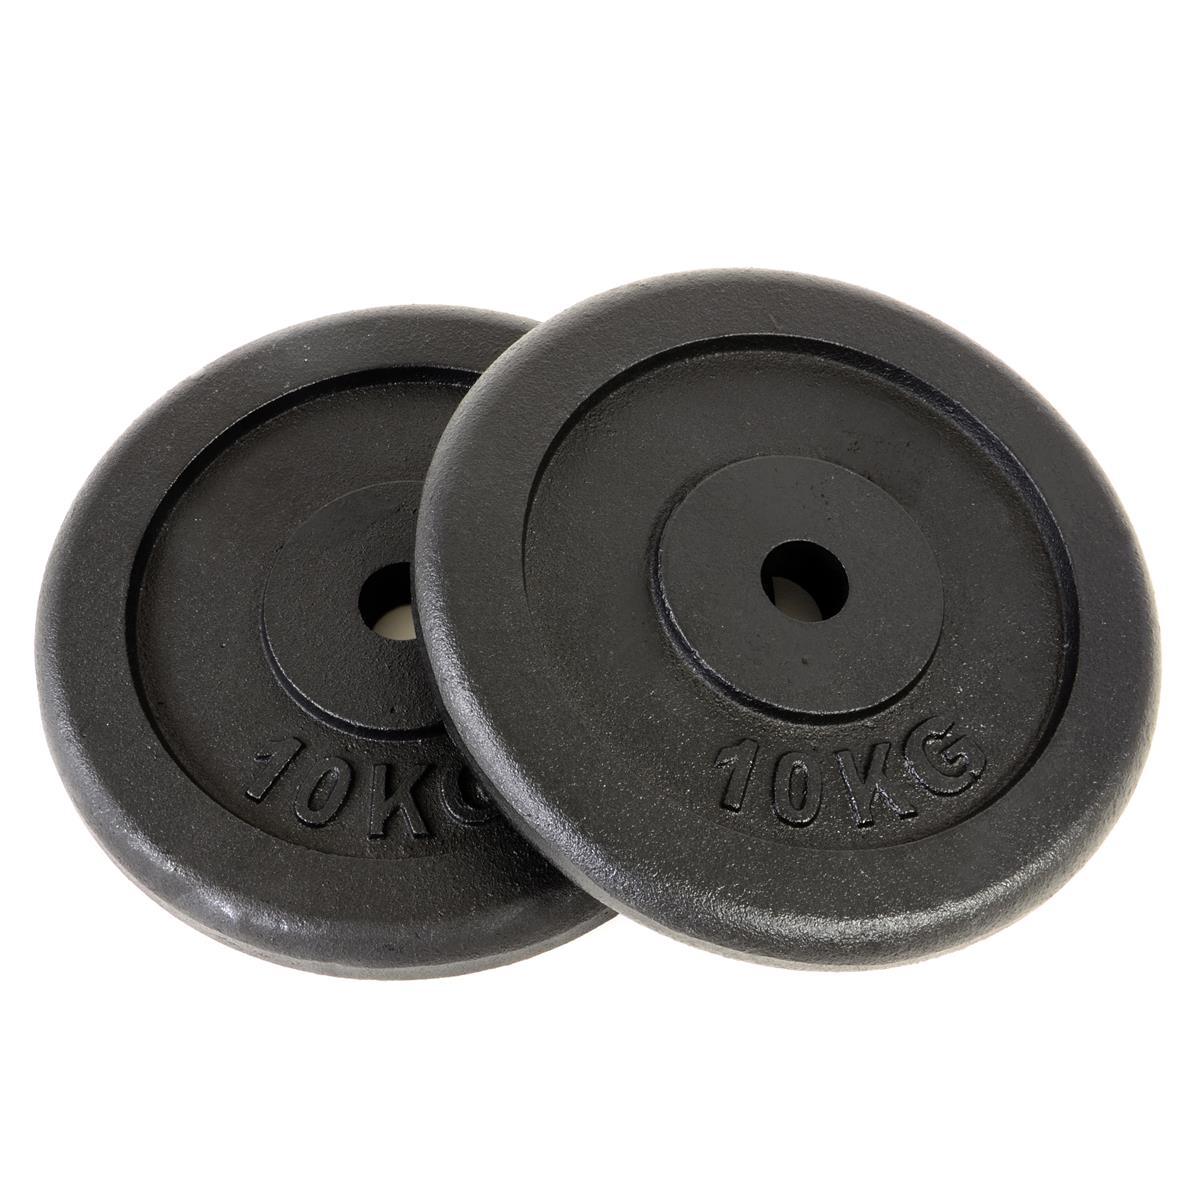 Hantelscheibe 2er Set Gewichtsplatte je 10 Kg schwarz 20 kg